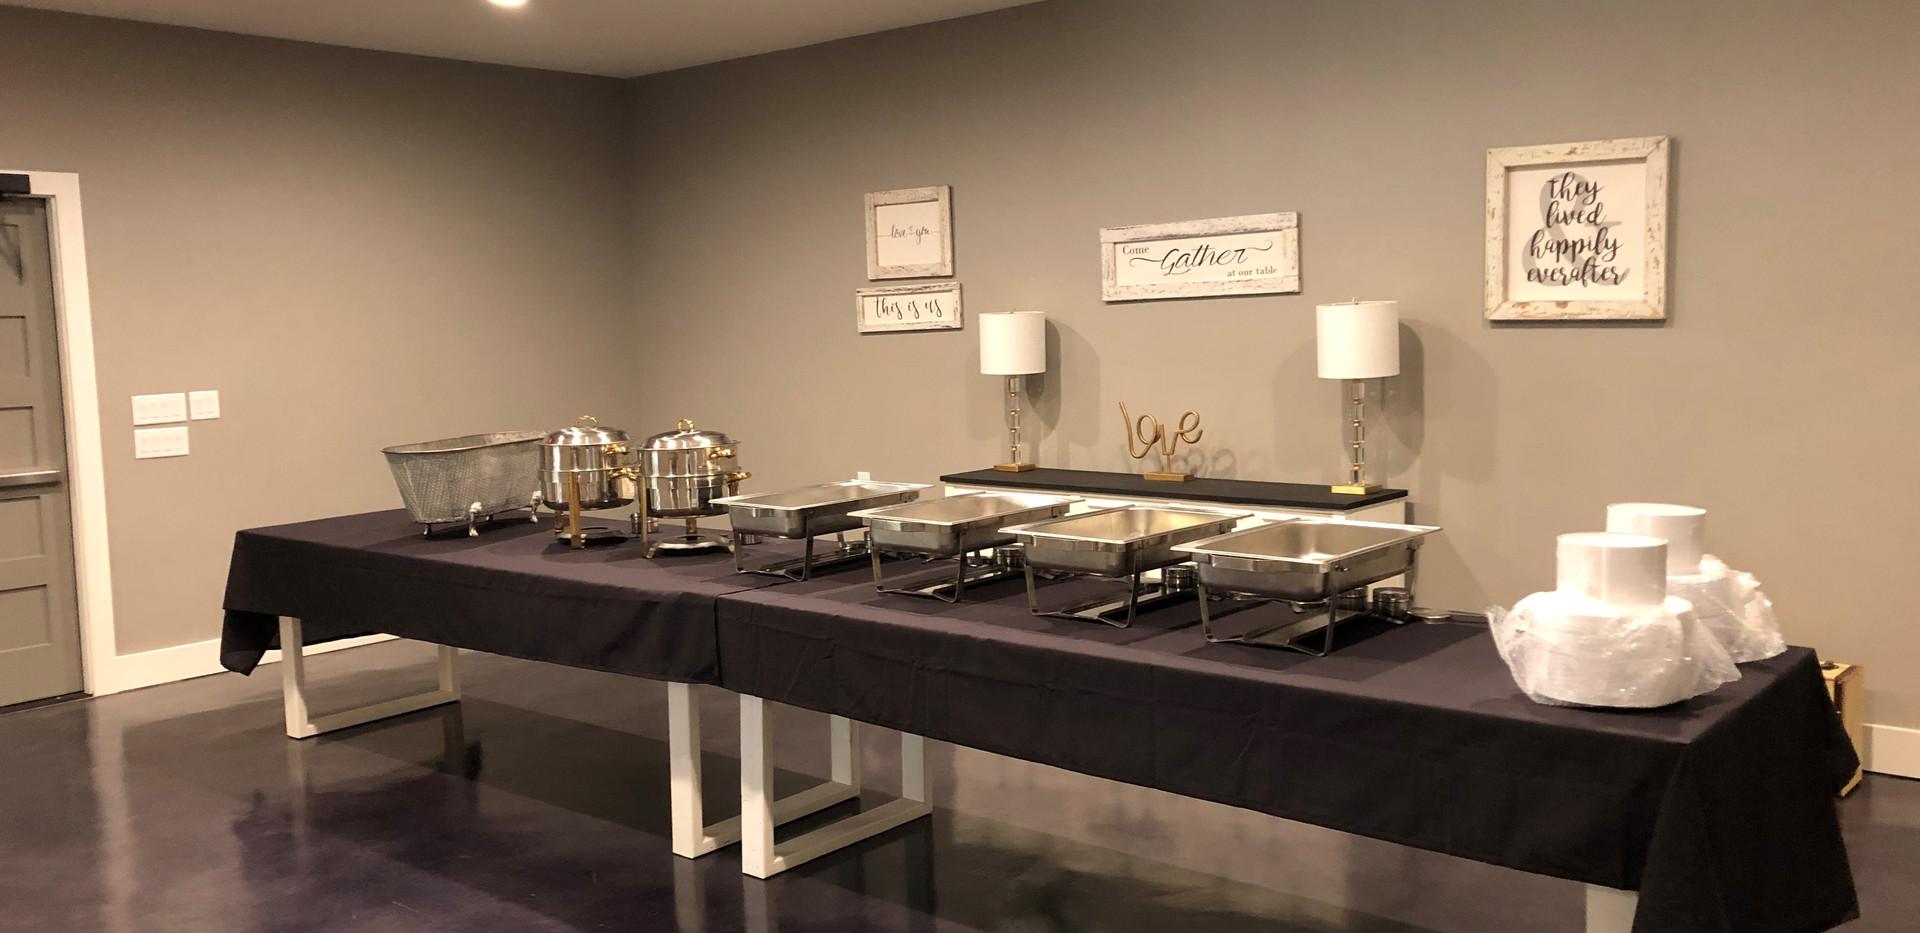 Buffet Room.jpg